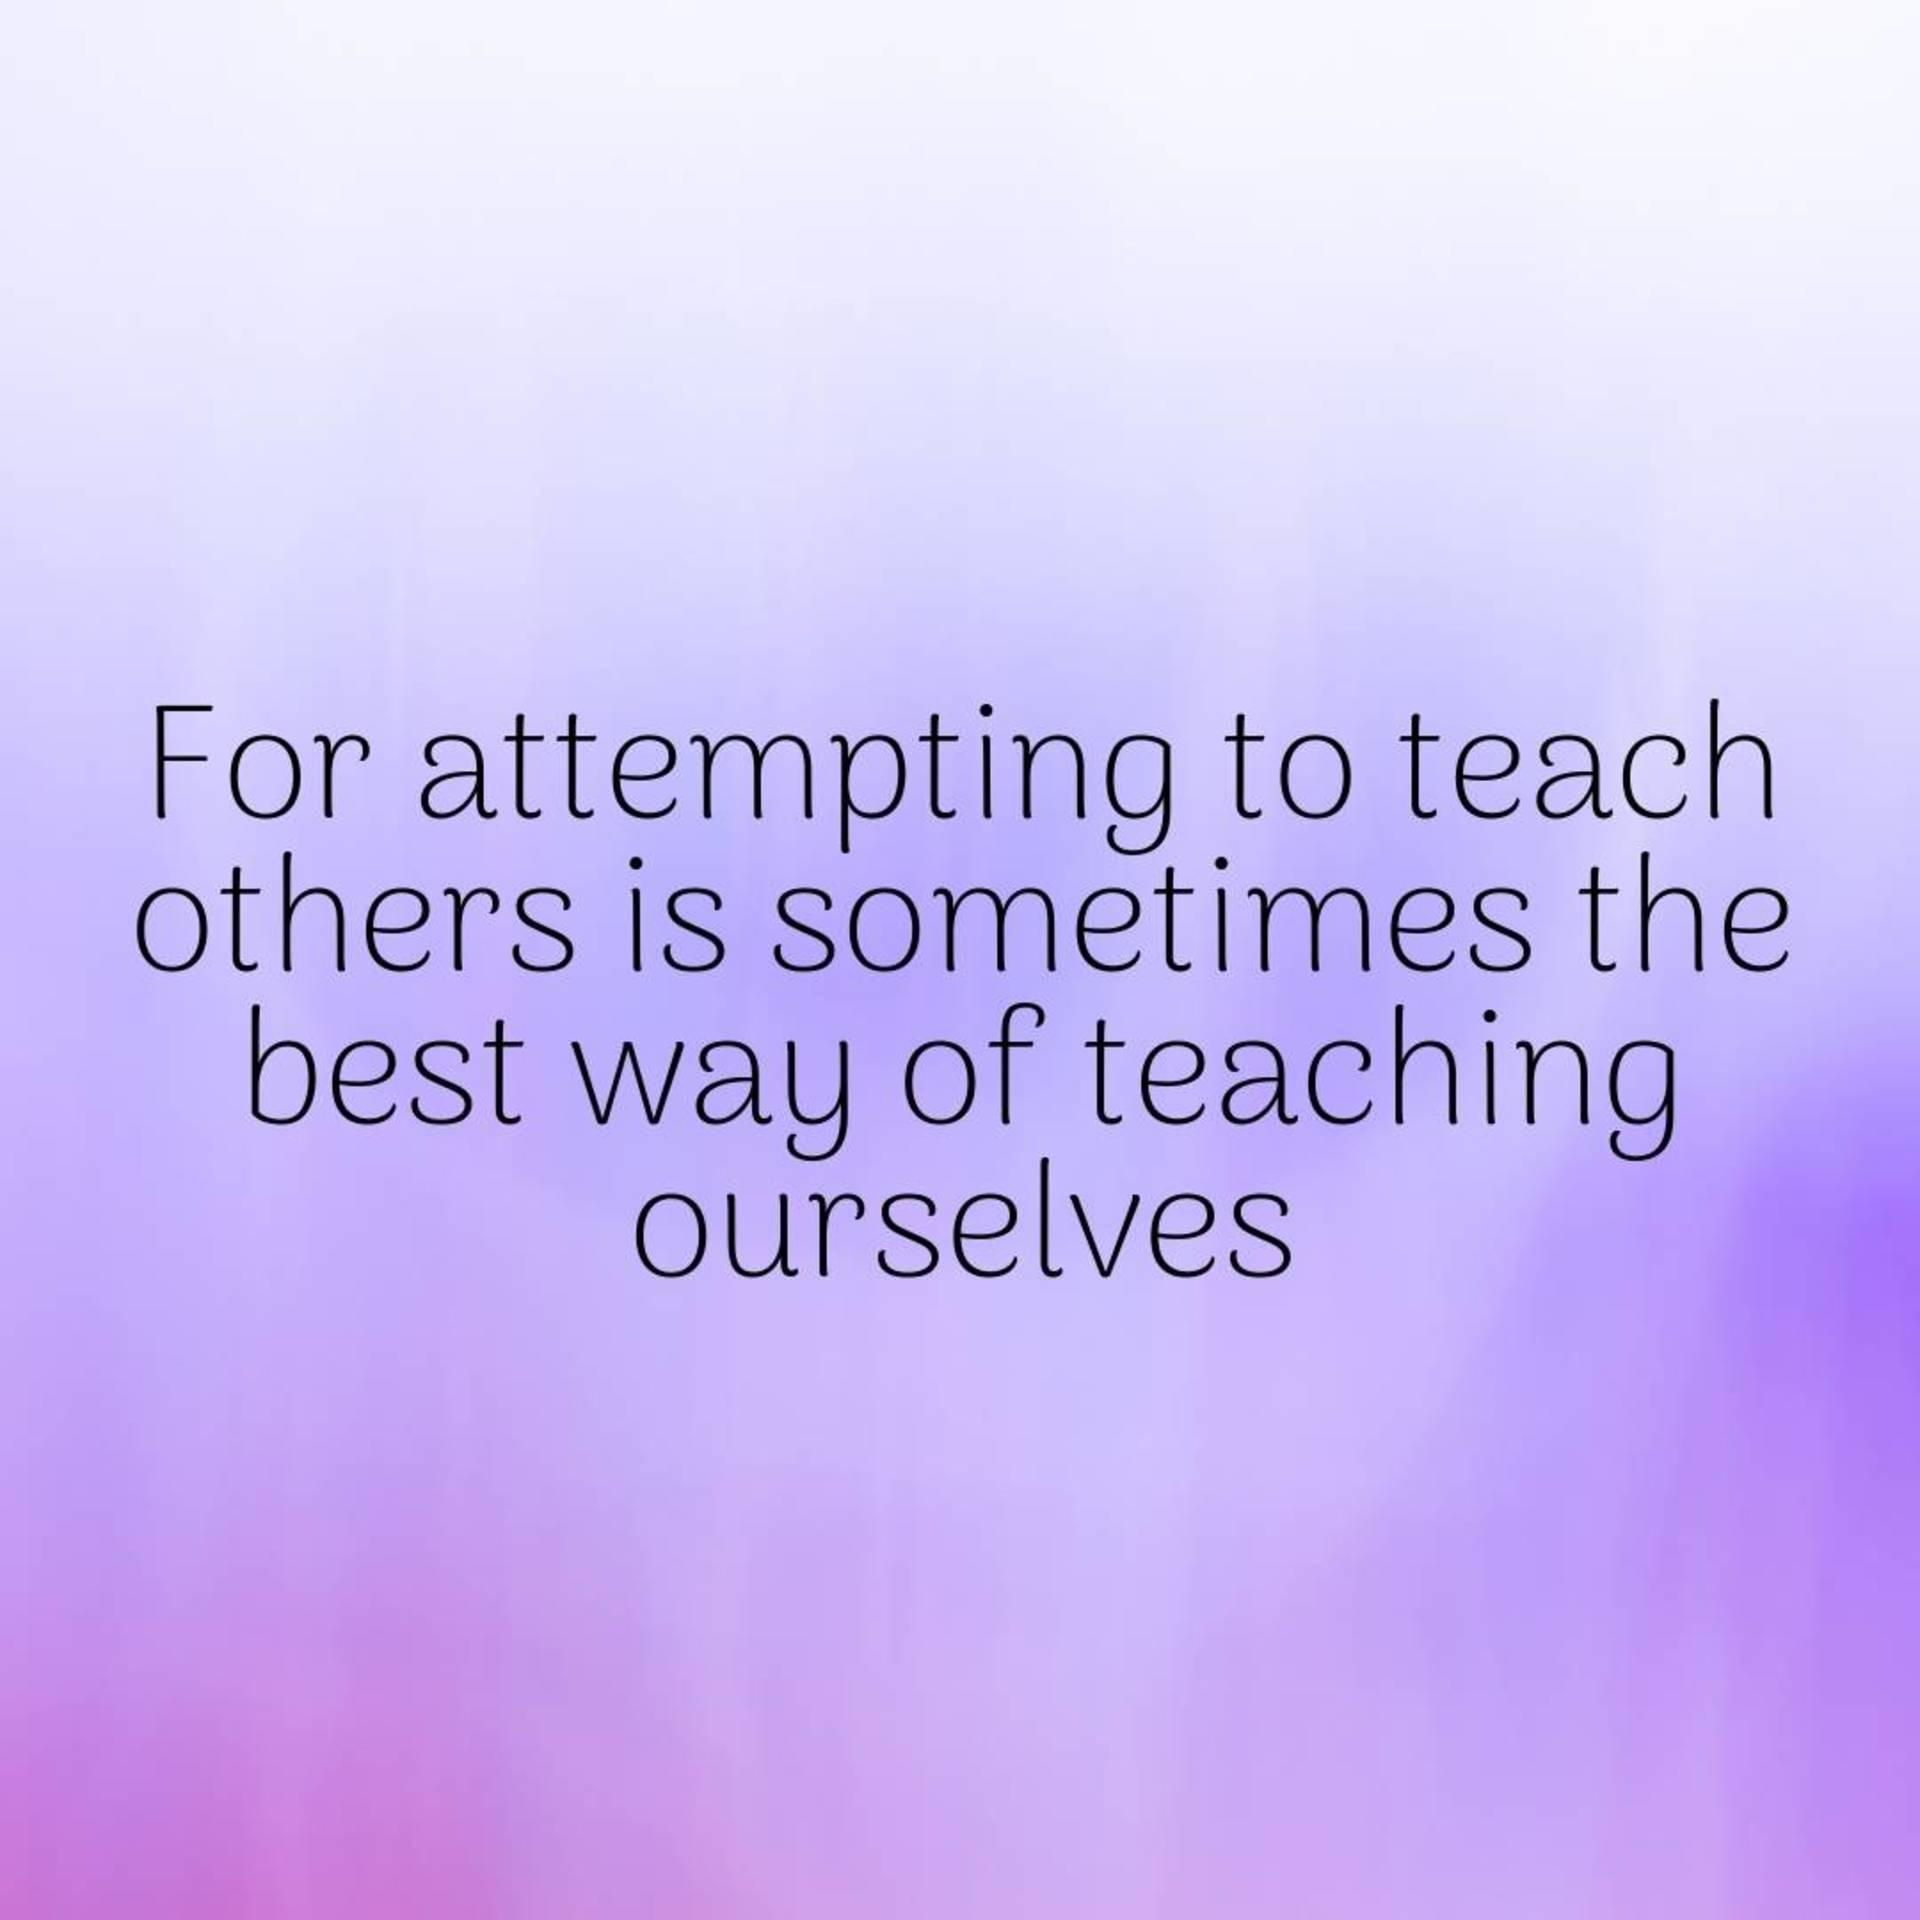 IshtyleAwhile - teaching